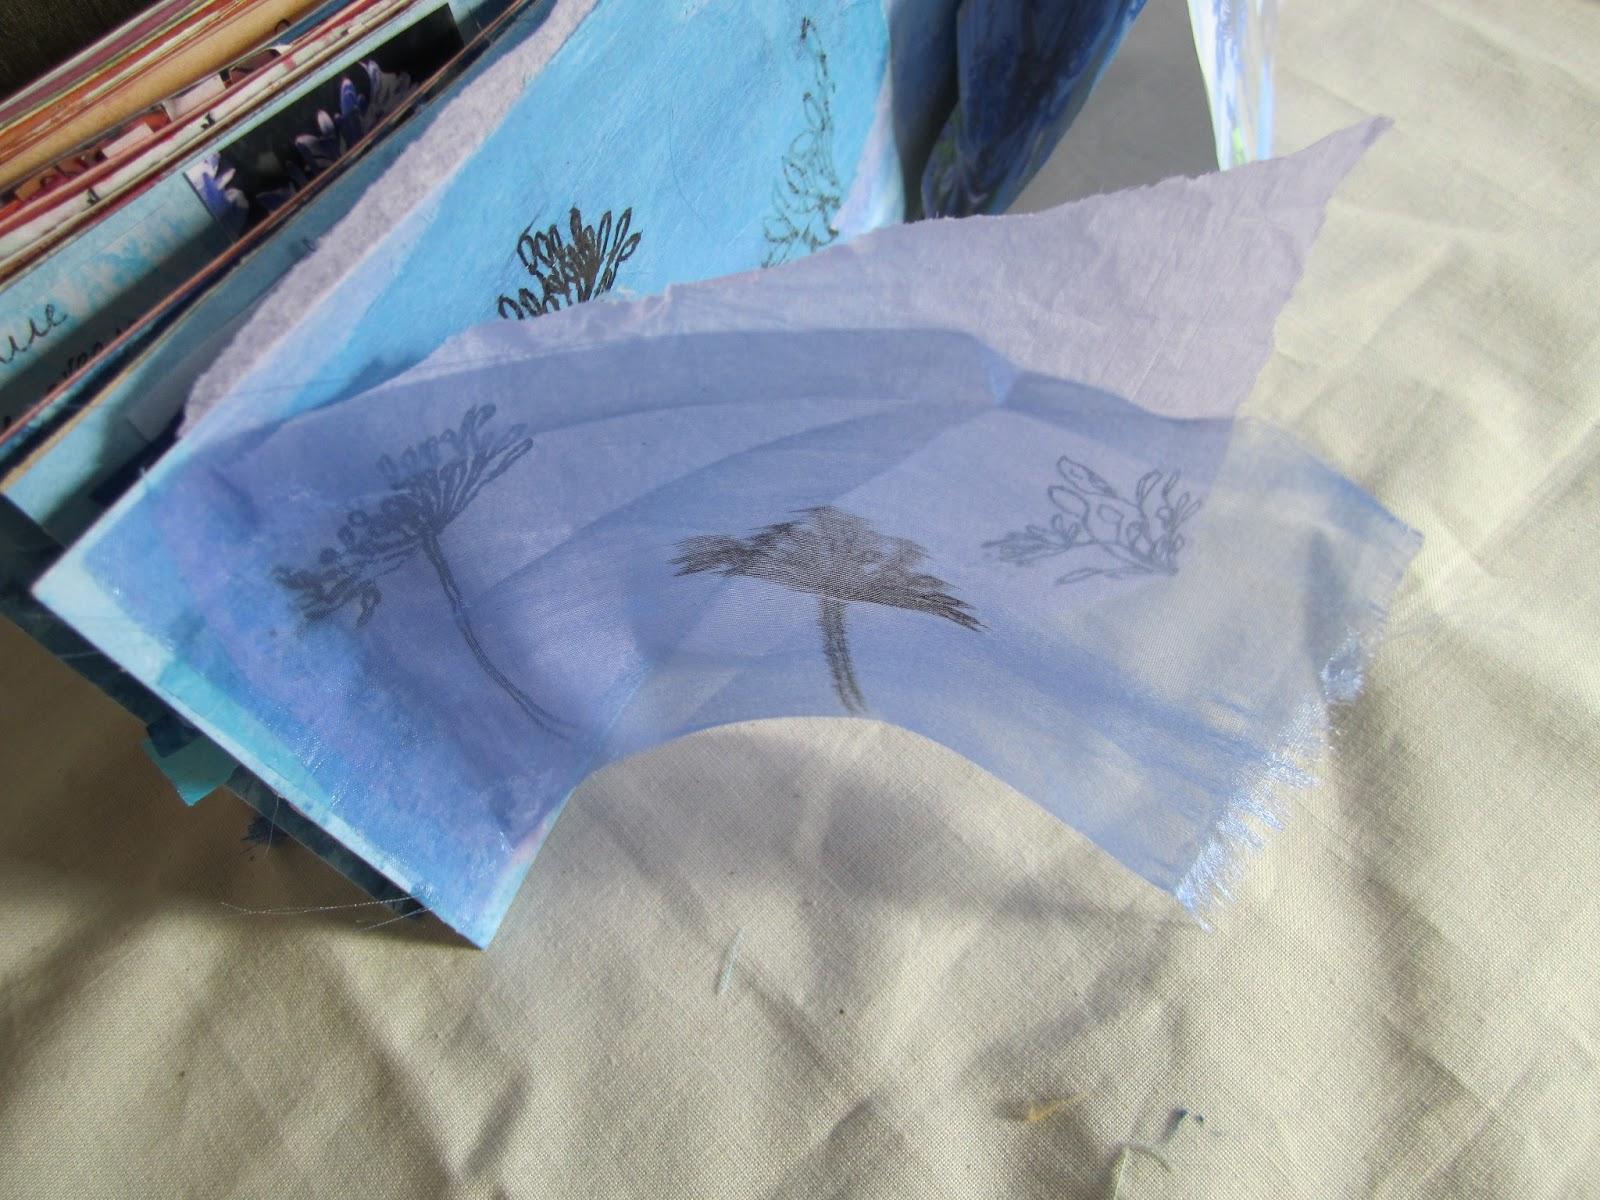 http://1.bp.blogspot.com/-Y87fEkNXAL0/UStJ1x3ynaI/AAAAAAAAAs0/QSo4dDqjySQ/s1600/Blue+stitch+book+2013+007.jpg